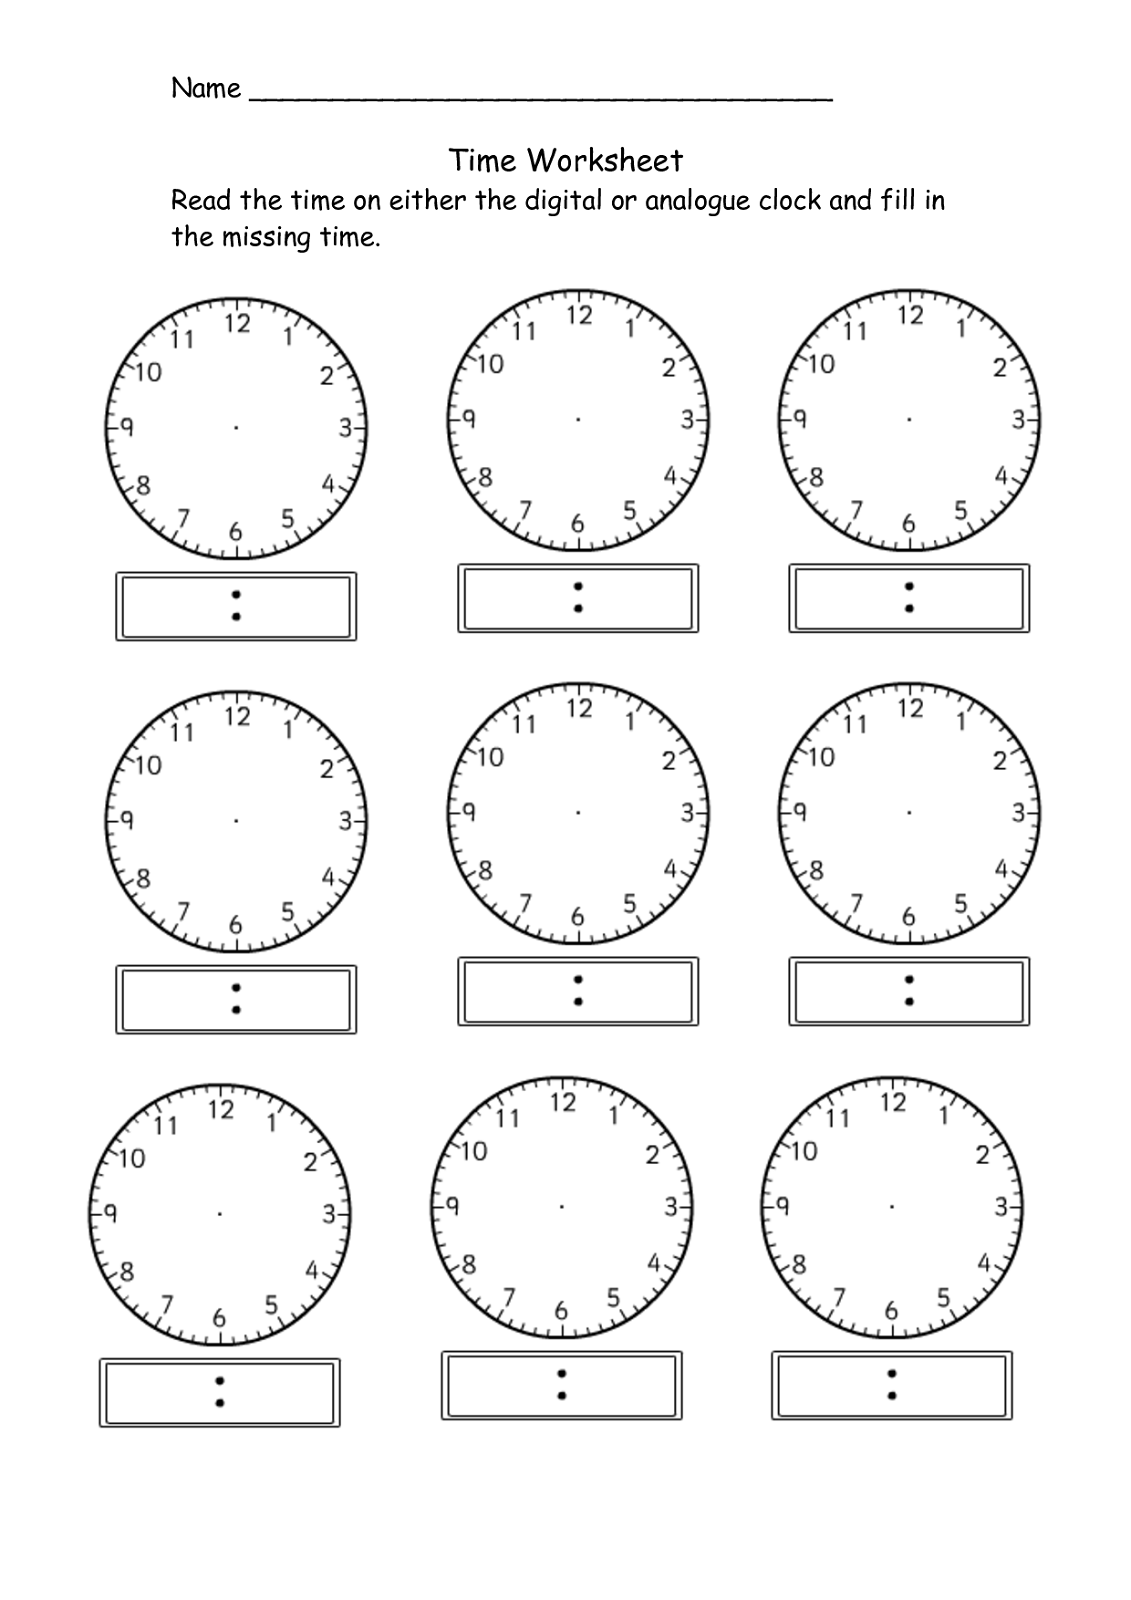 clock-face-worksheet-new